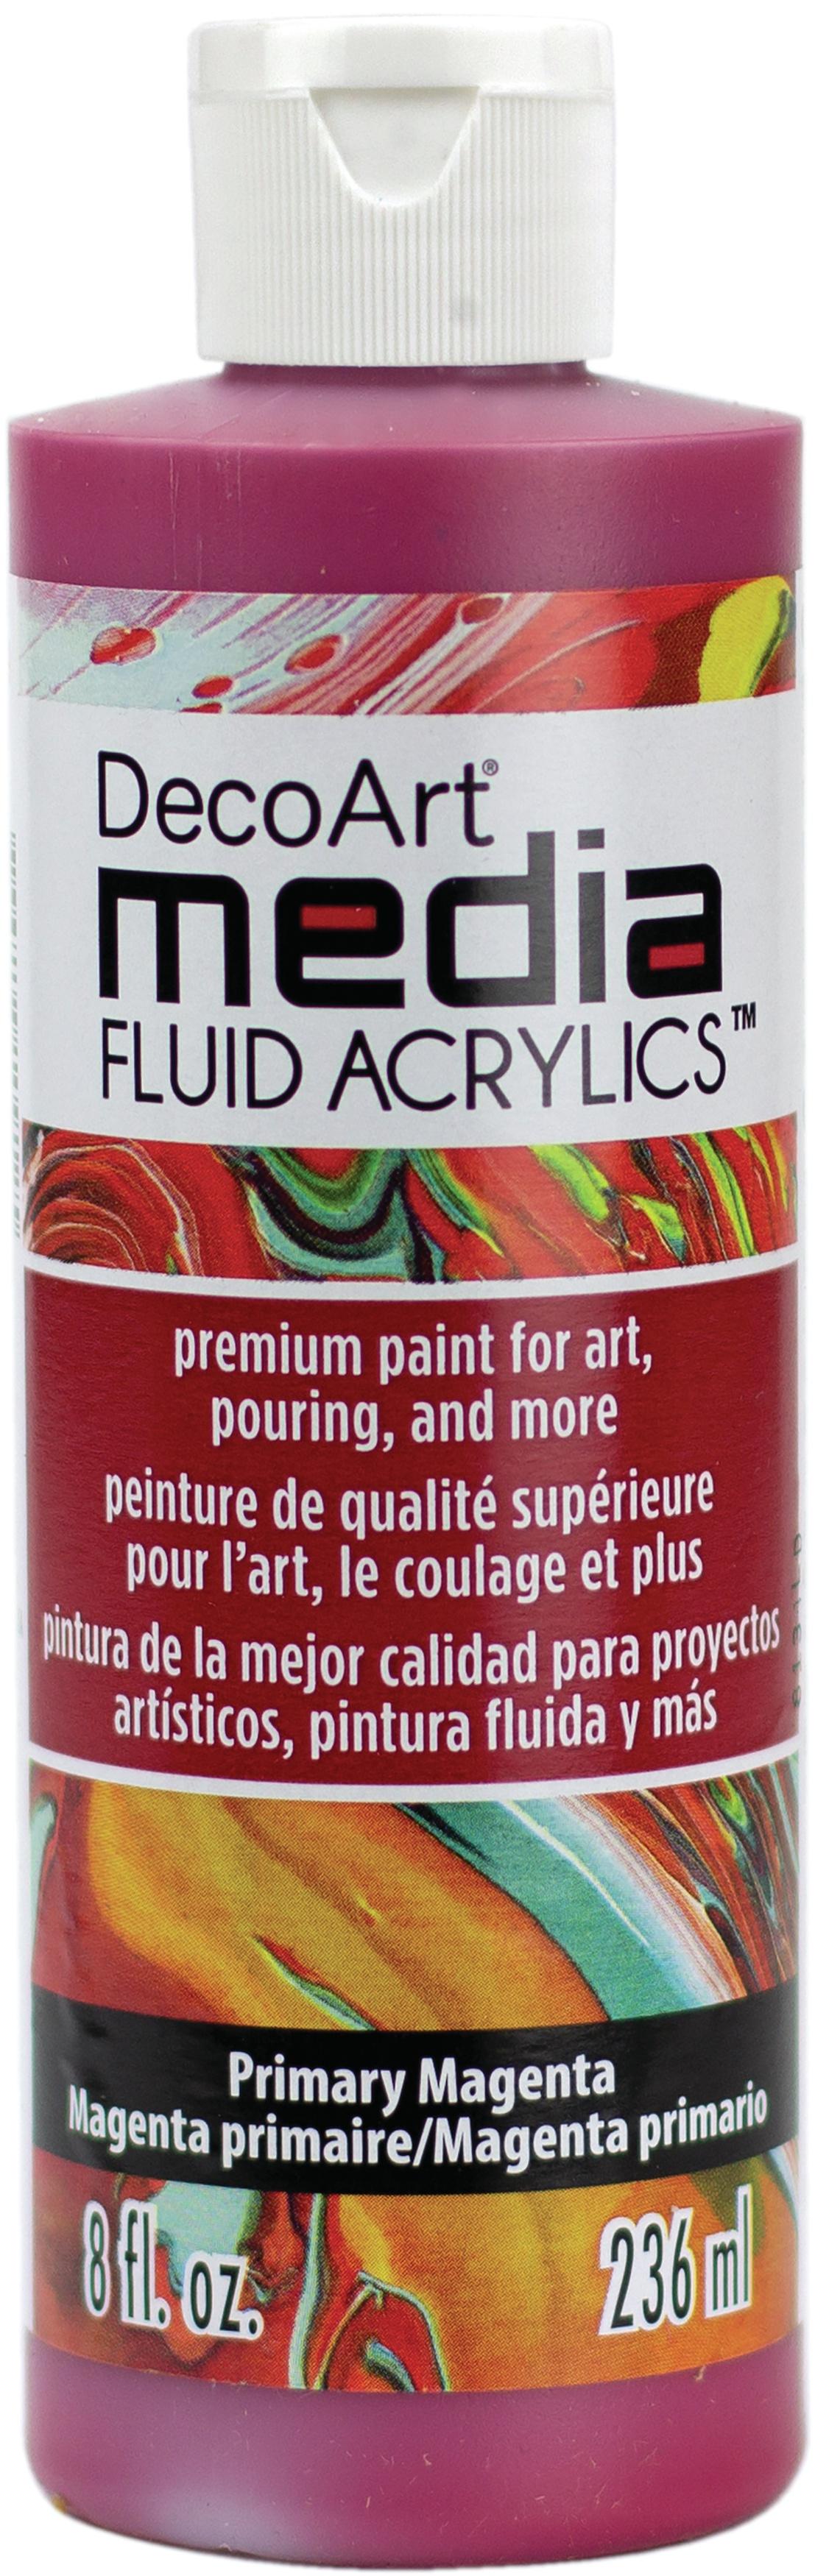 Media Fluid Acrylic Paint 8oz-Primary Magenta